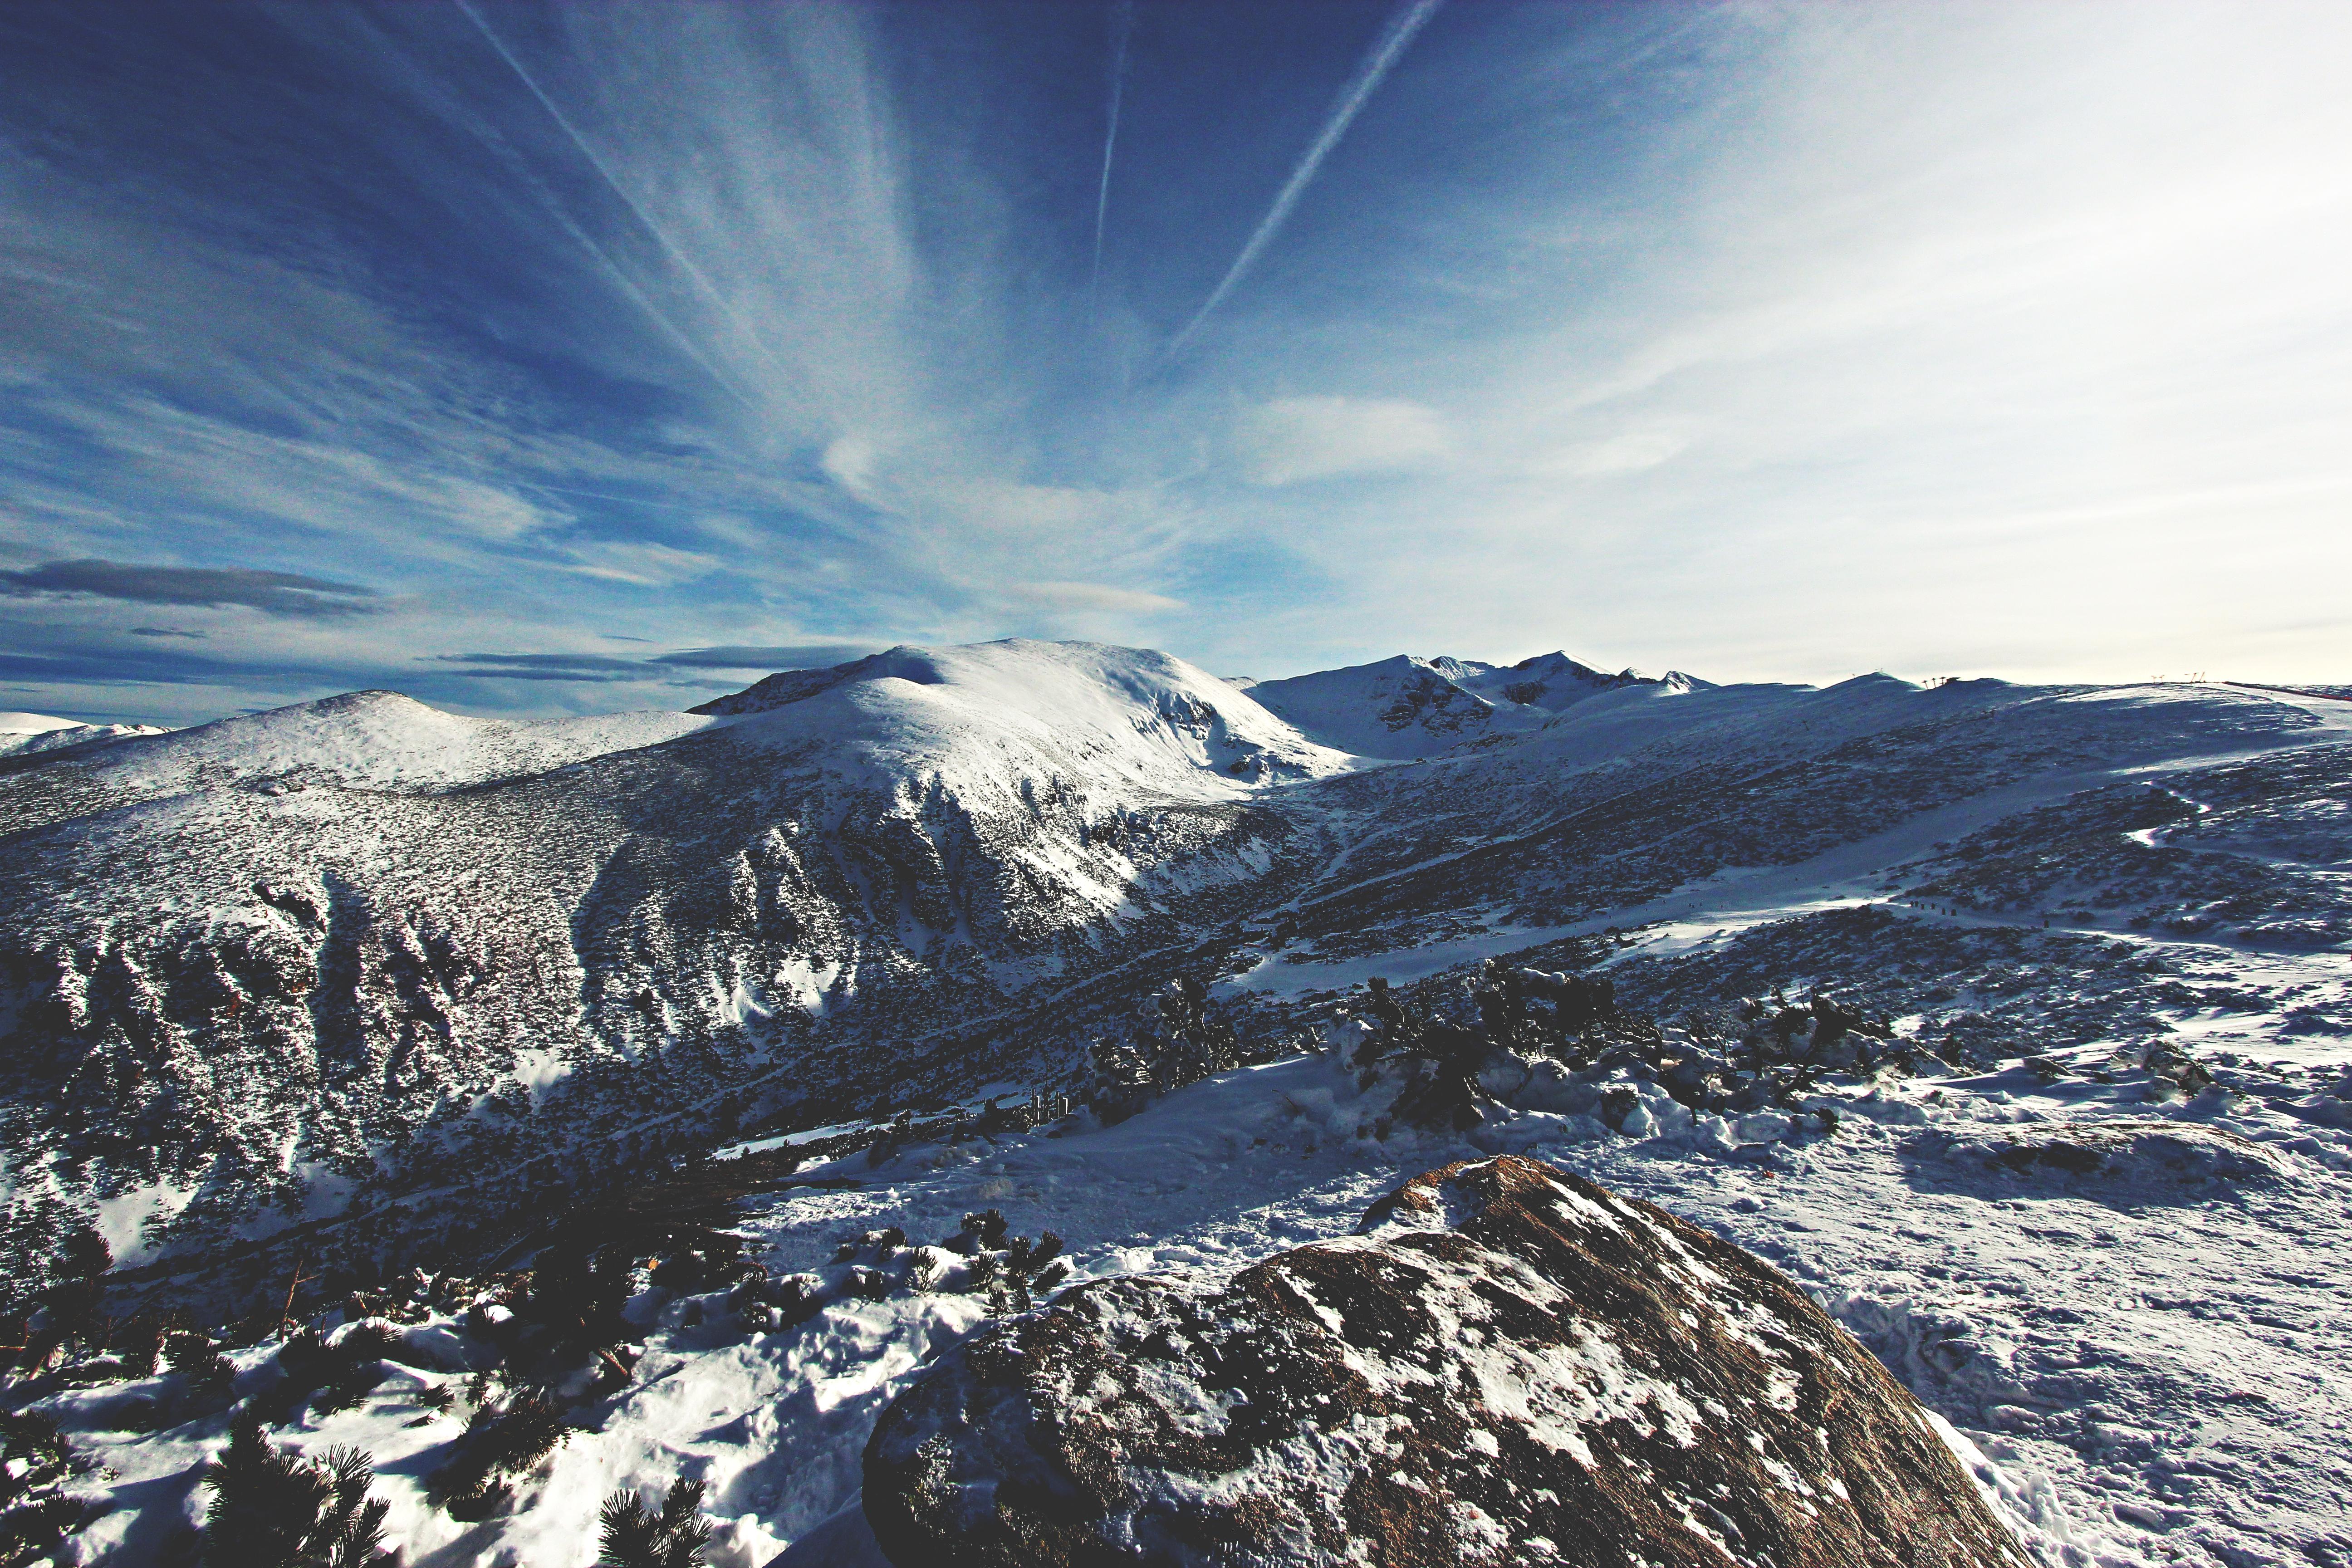 Bulgarian Mountains by NitroAllah on DeviantArt